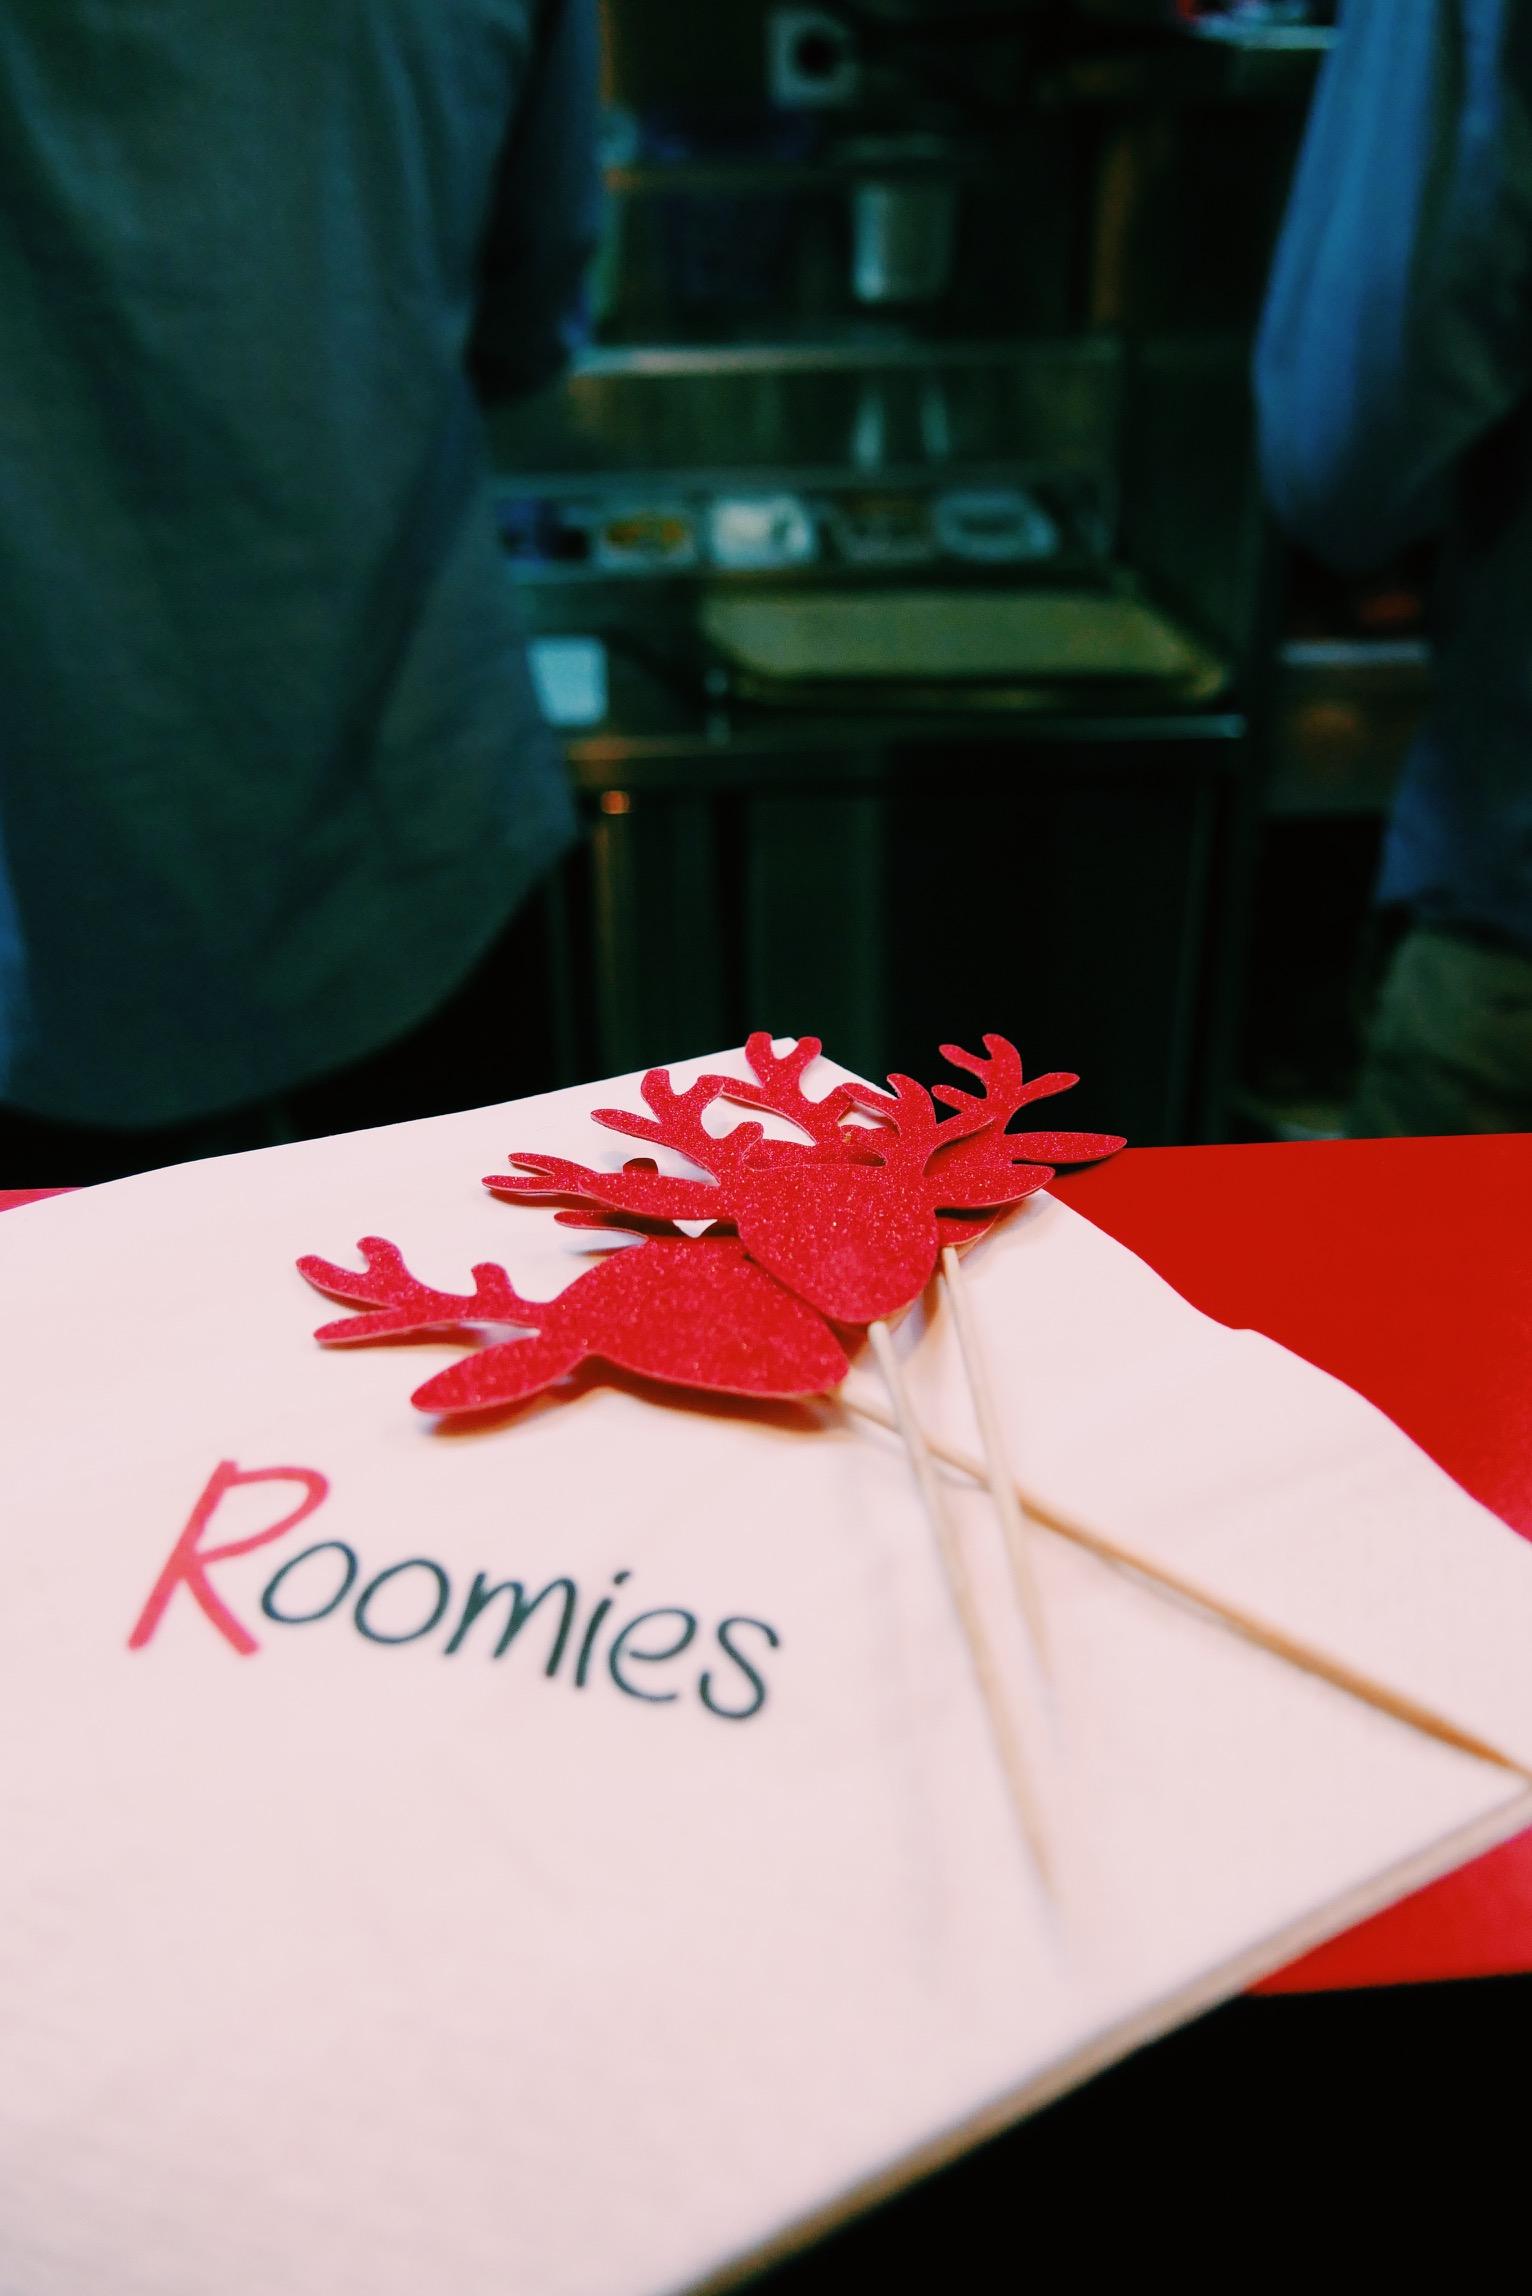 Roomies-burger-paris-carte-restaurant-miromesnil-photo-usofparis-blog